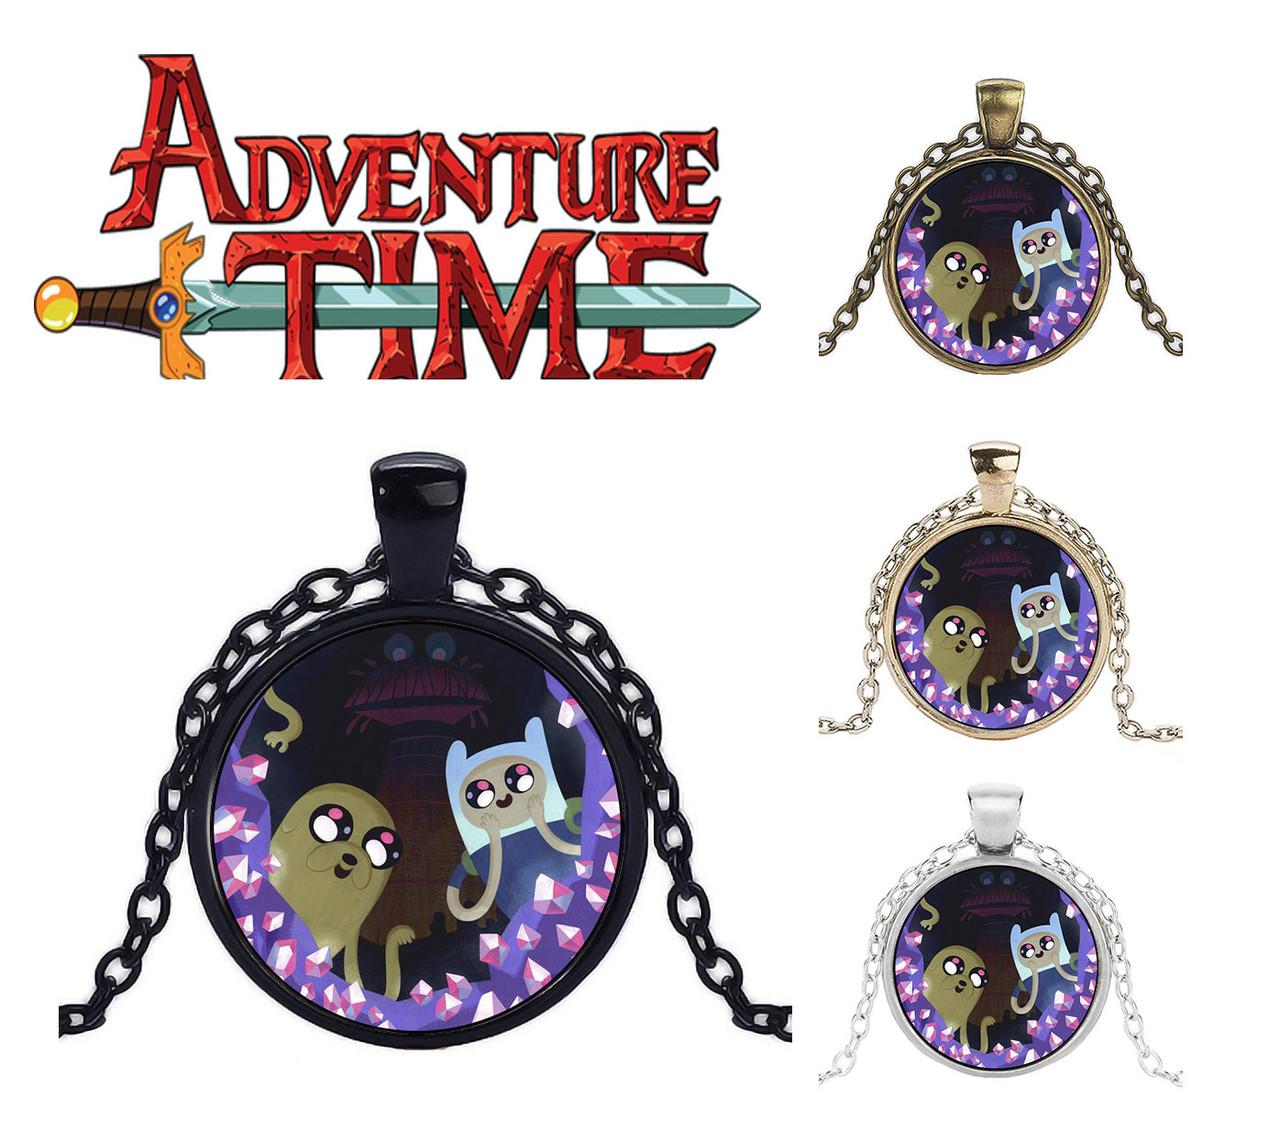 Кулон Adventure time Время приключений с кристалликами